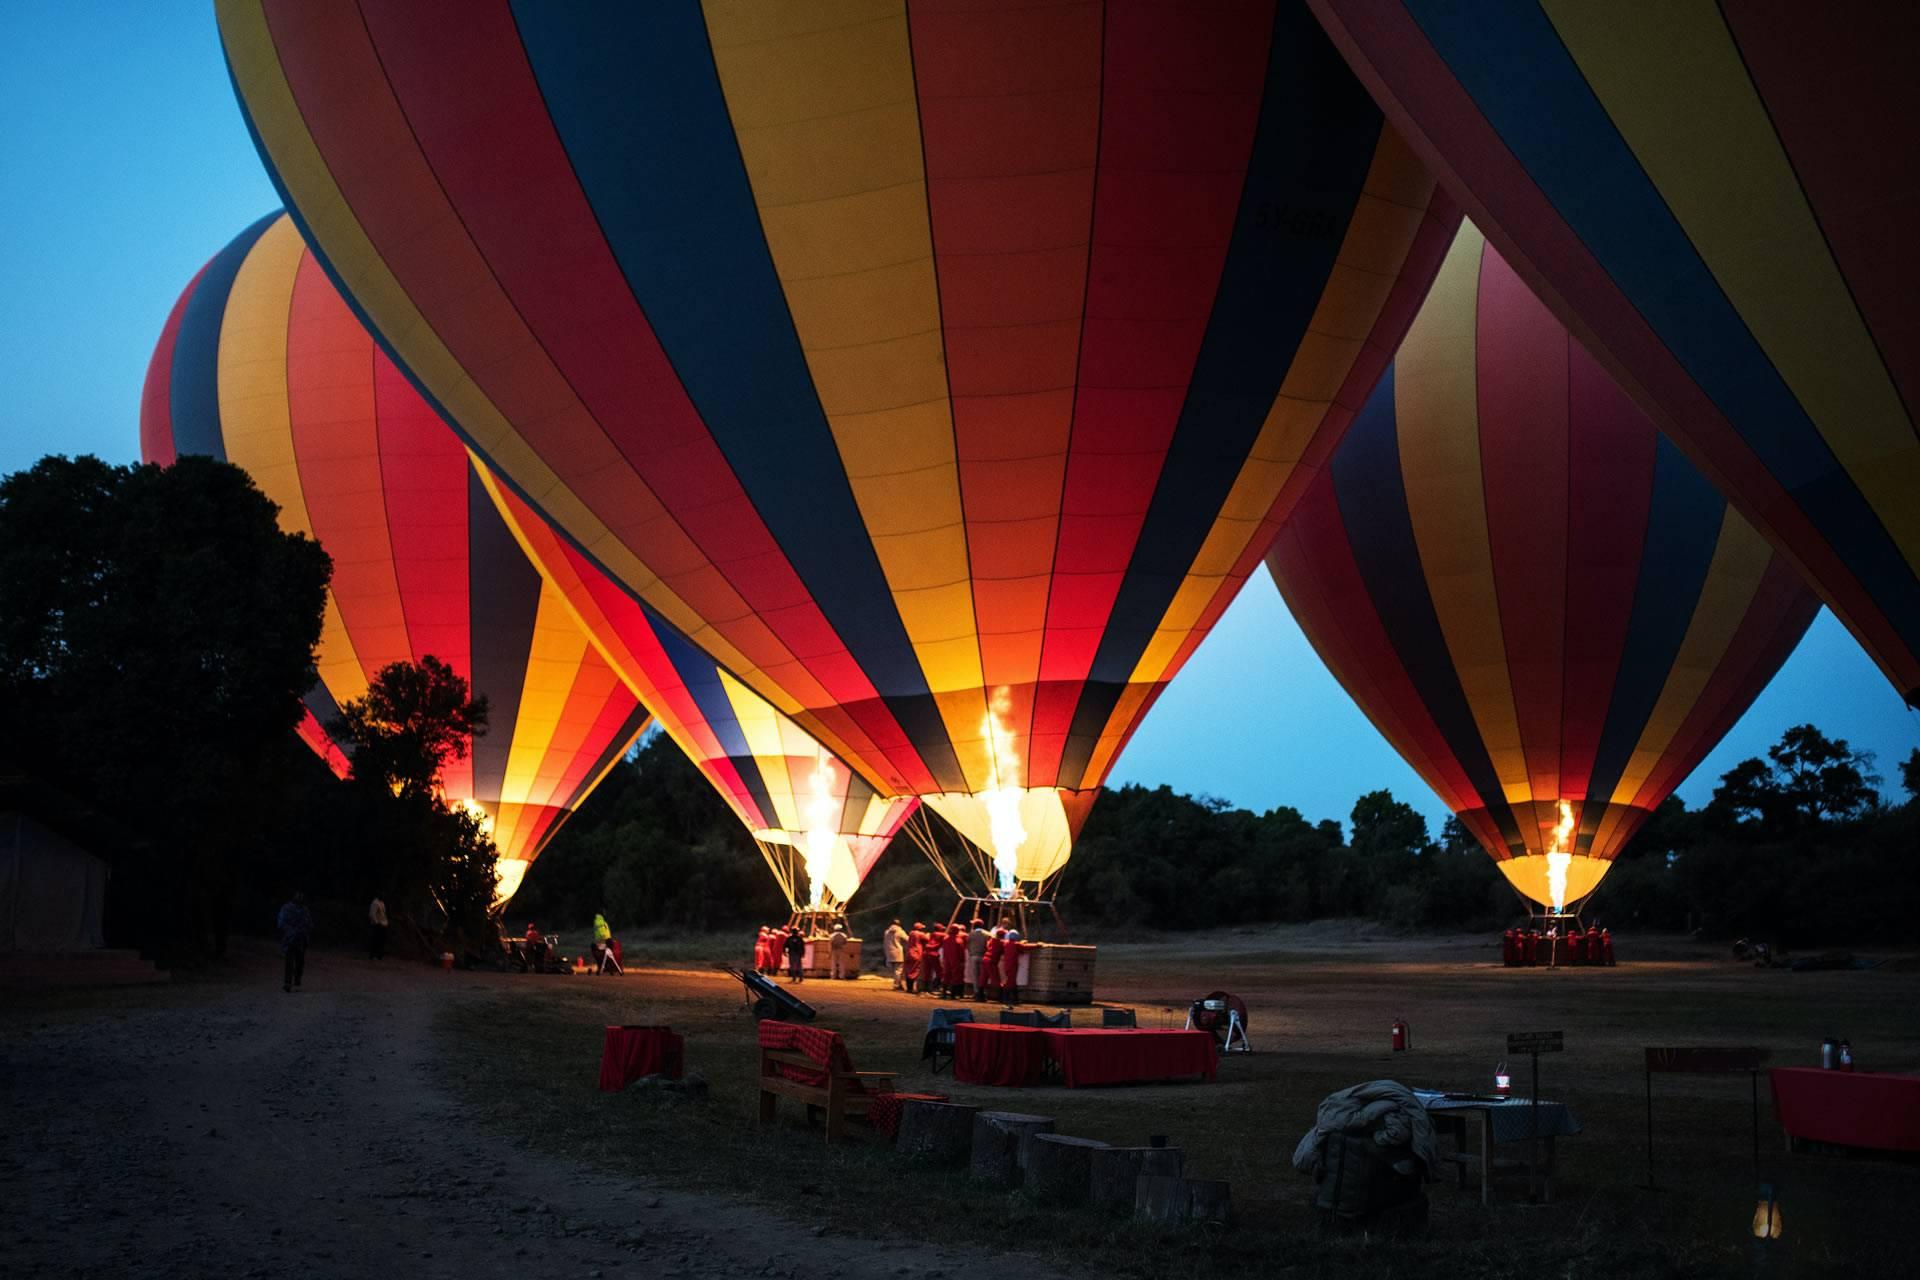 Tanzania Serengeti Air Balloon Safari